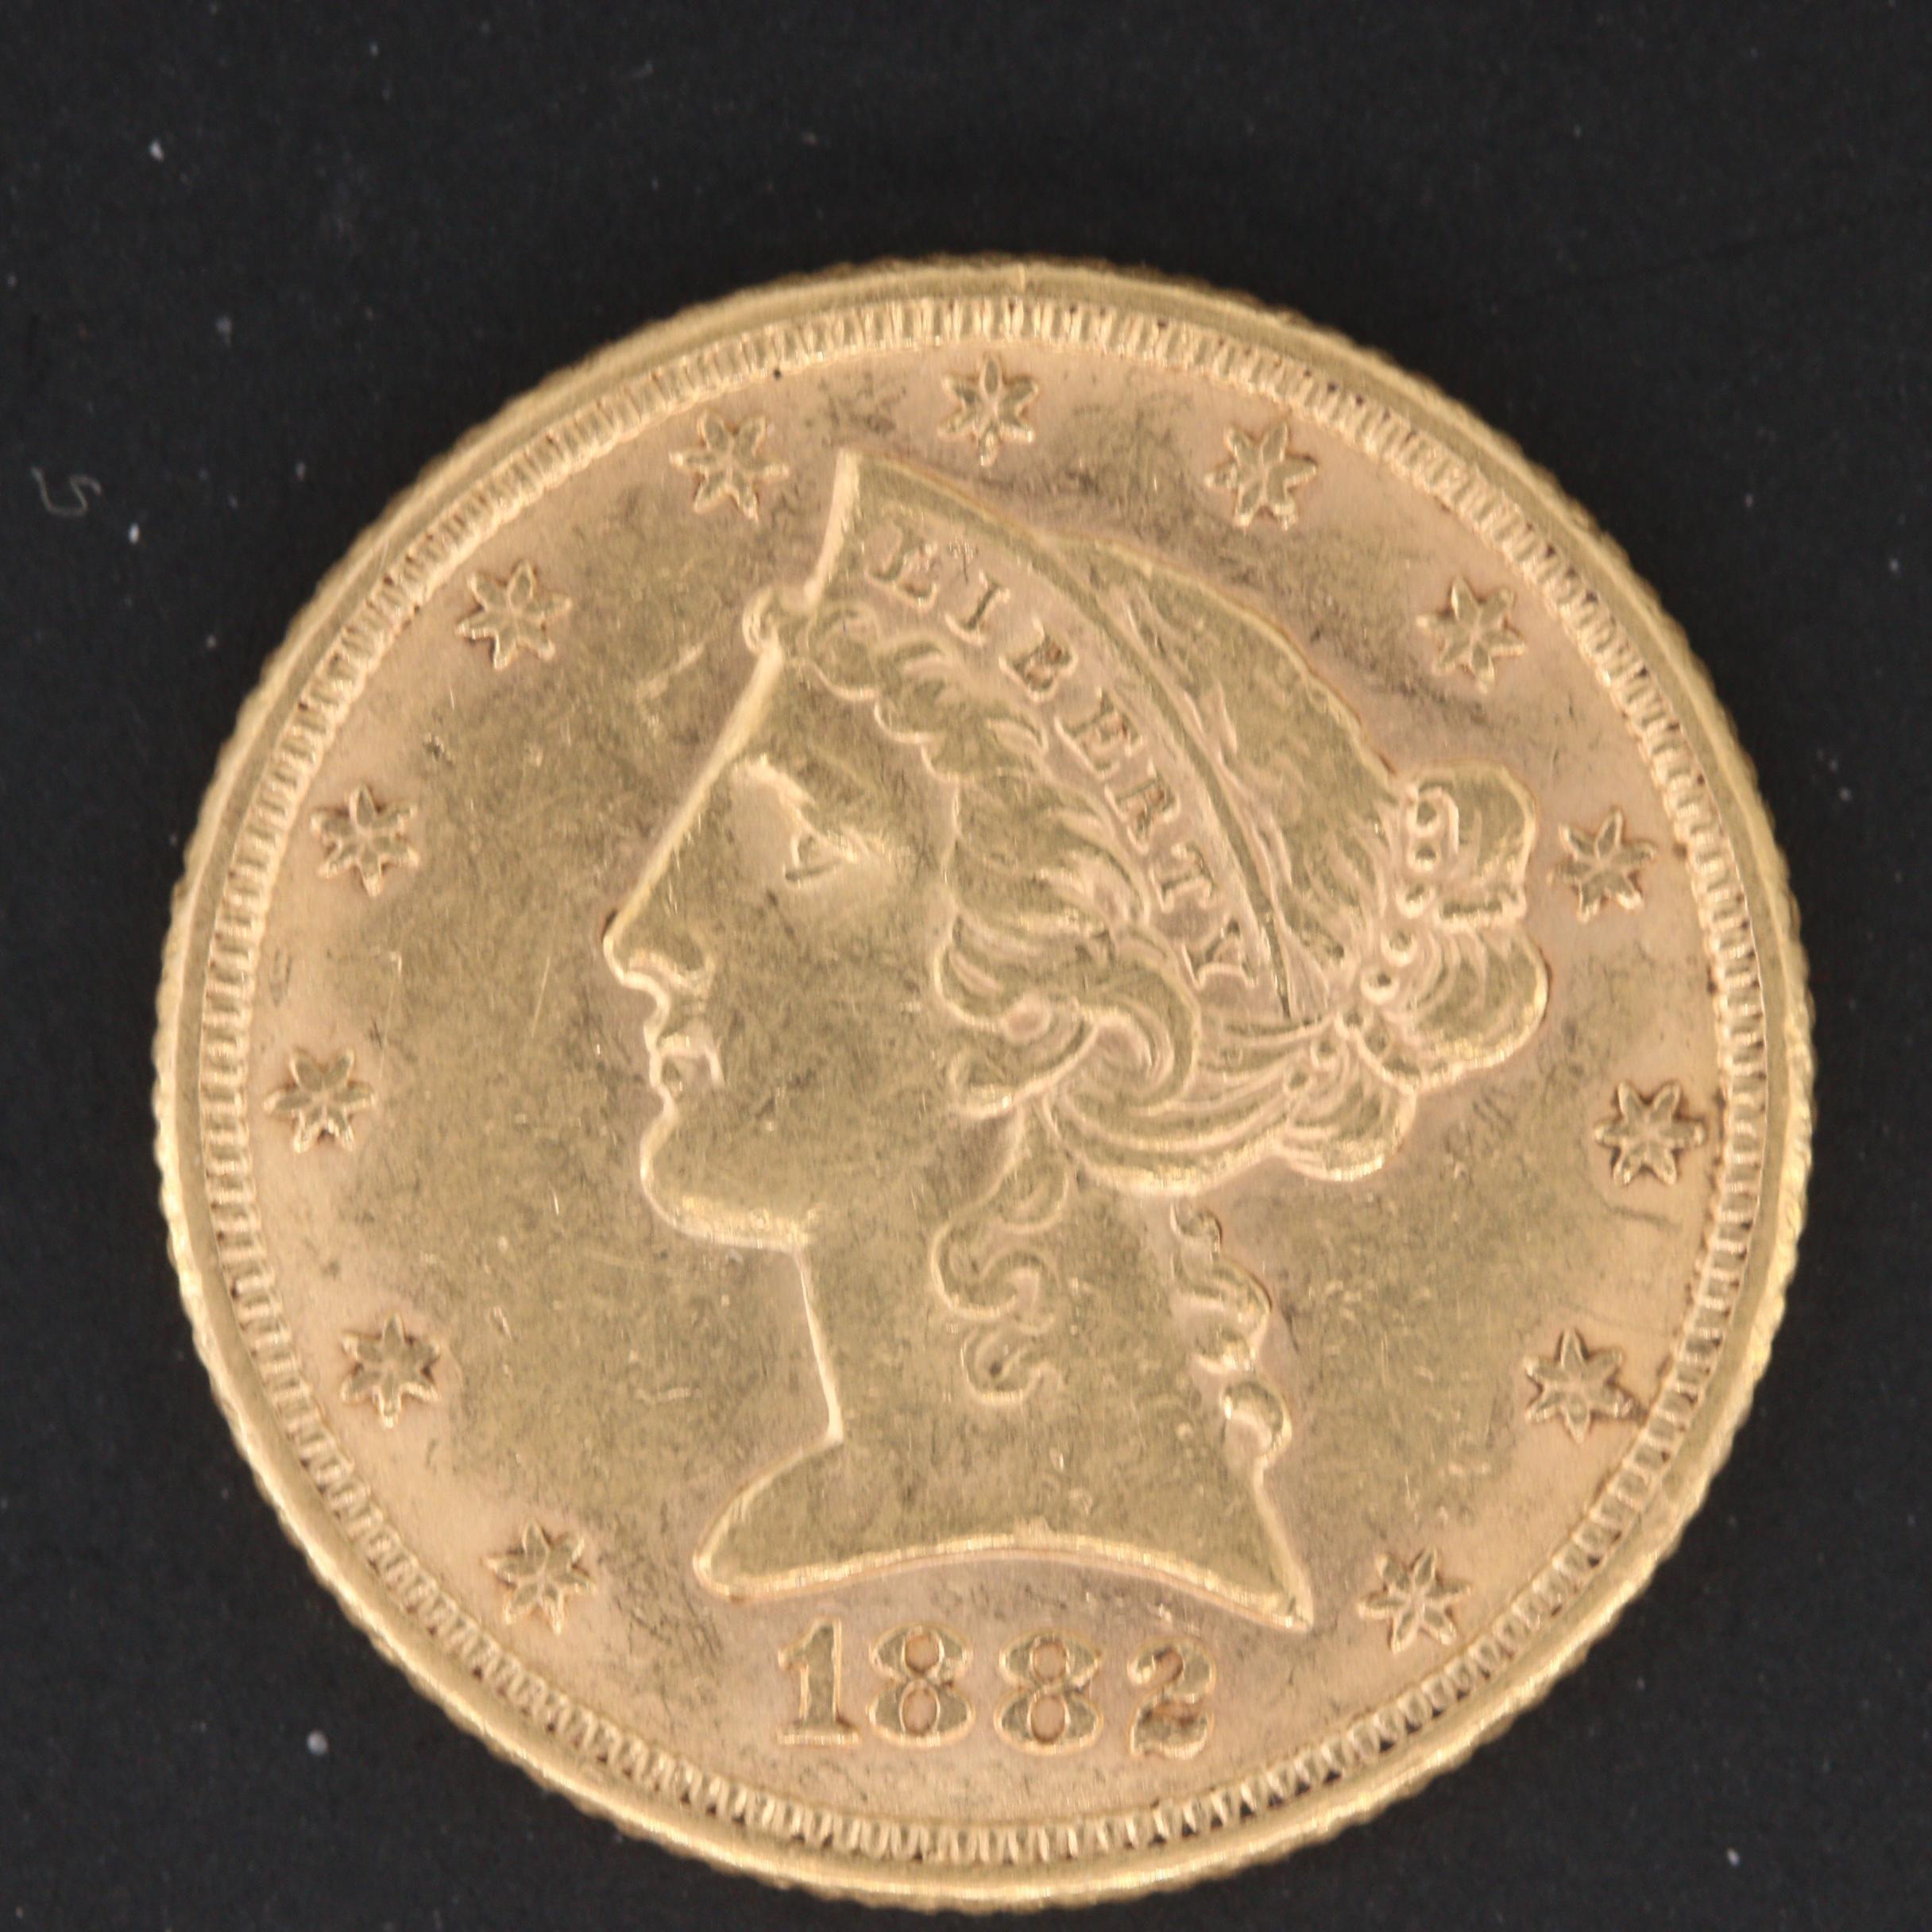 1882 Liberty Head $5 Half Eagle Gold Coin